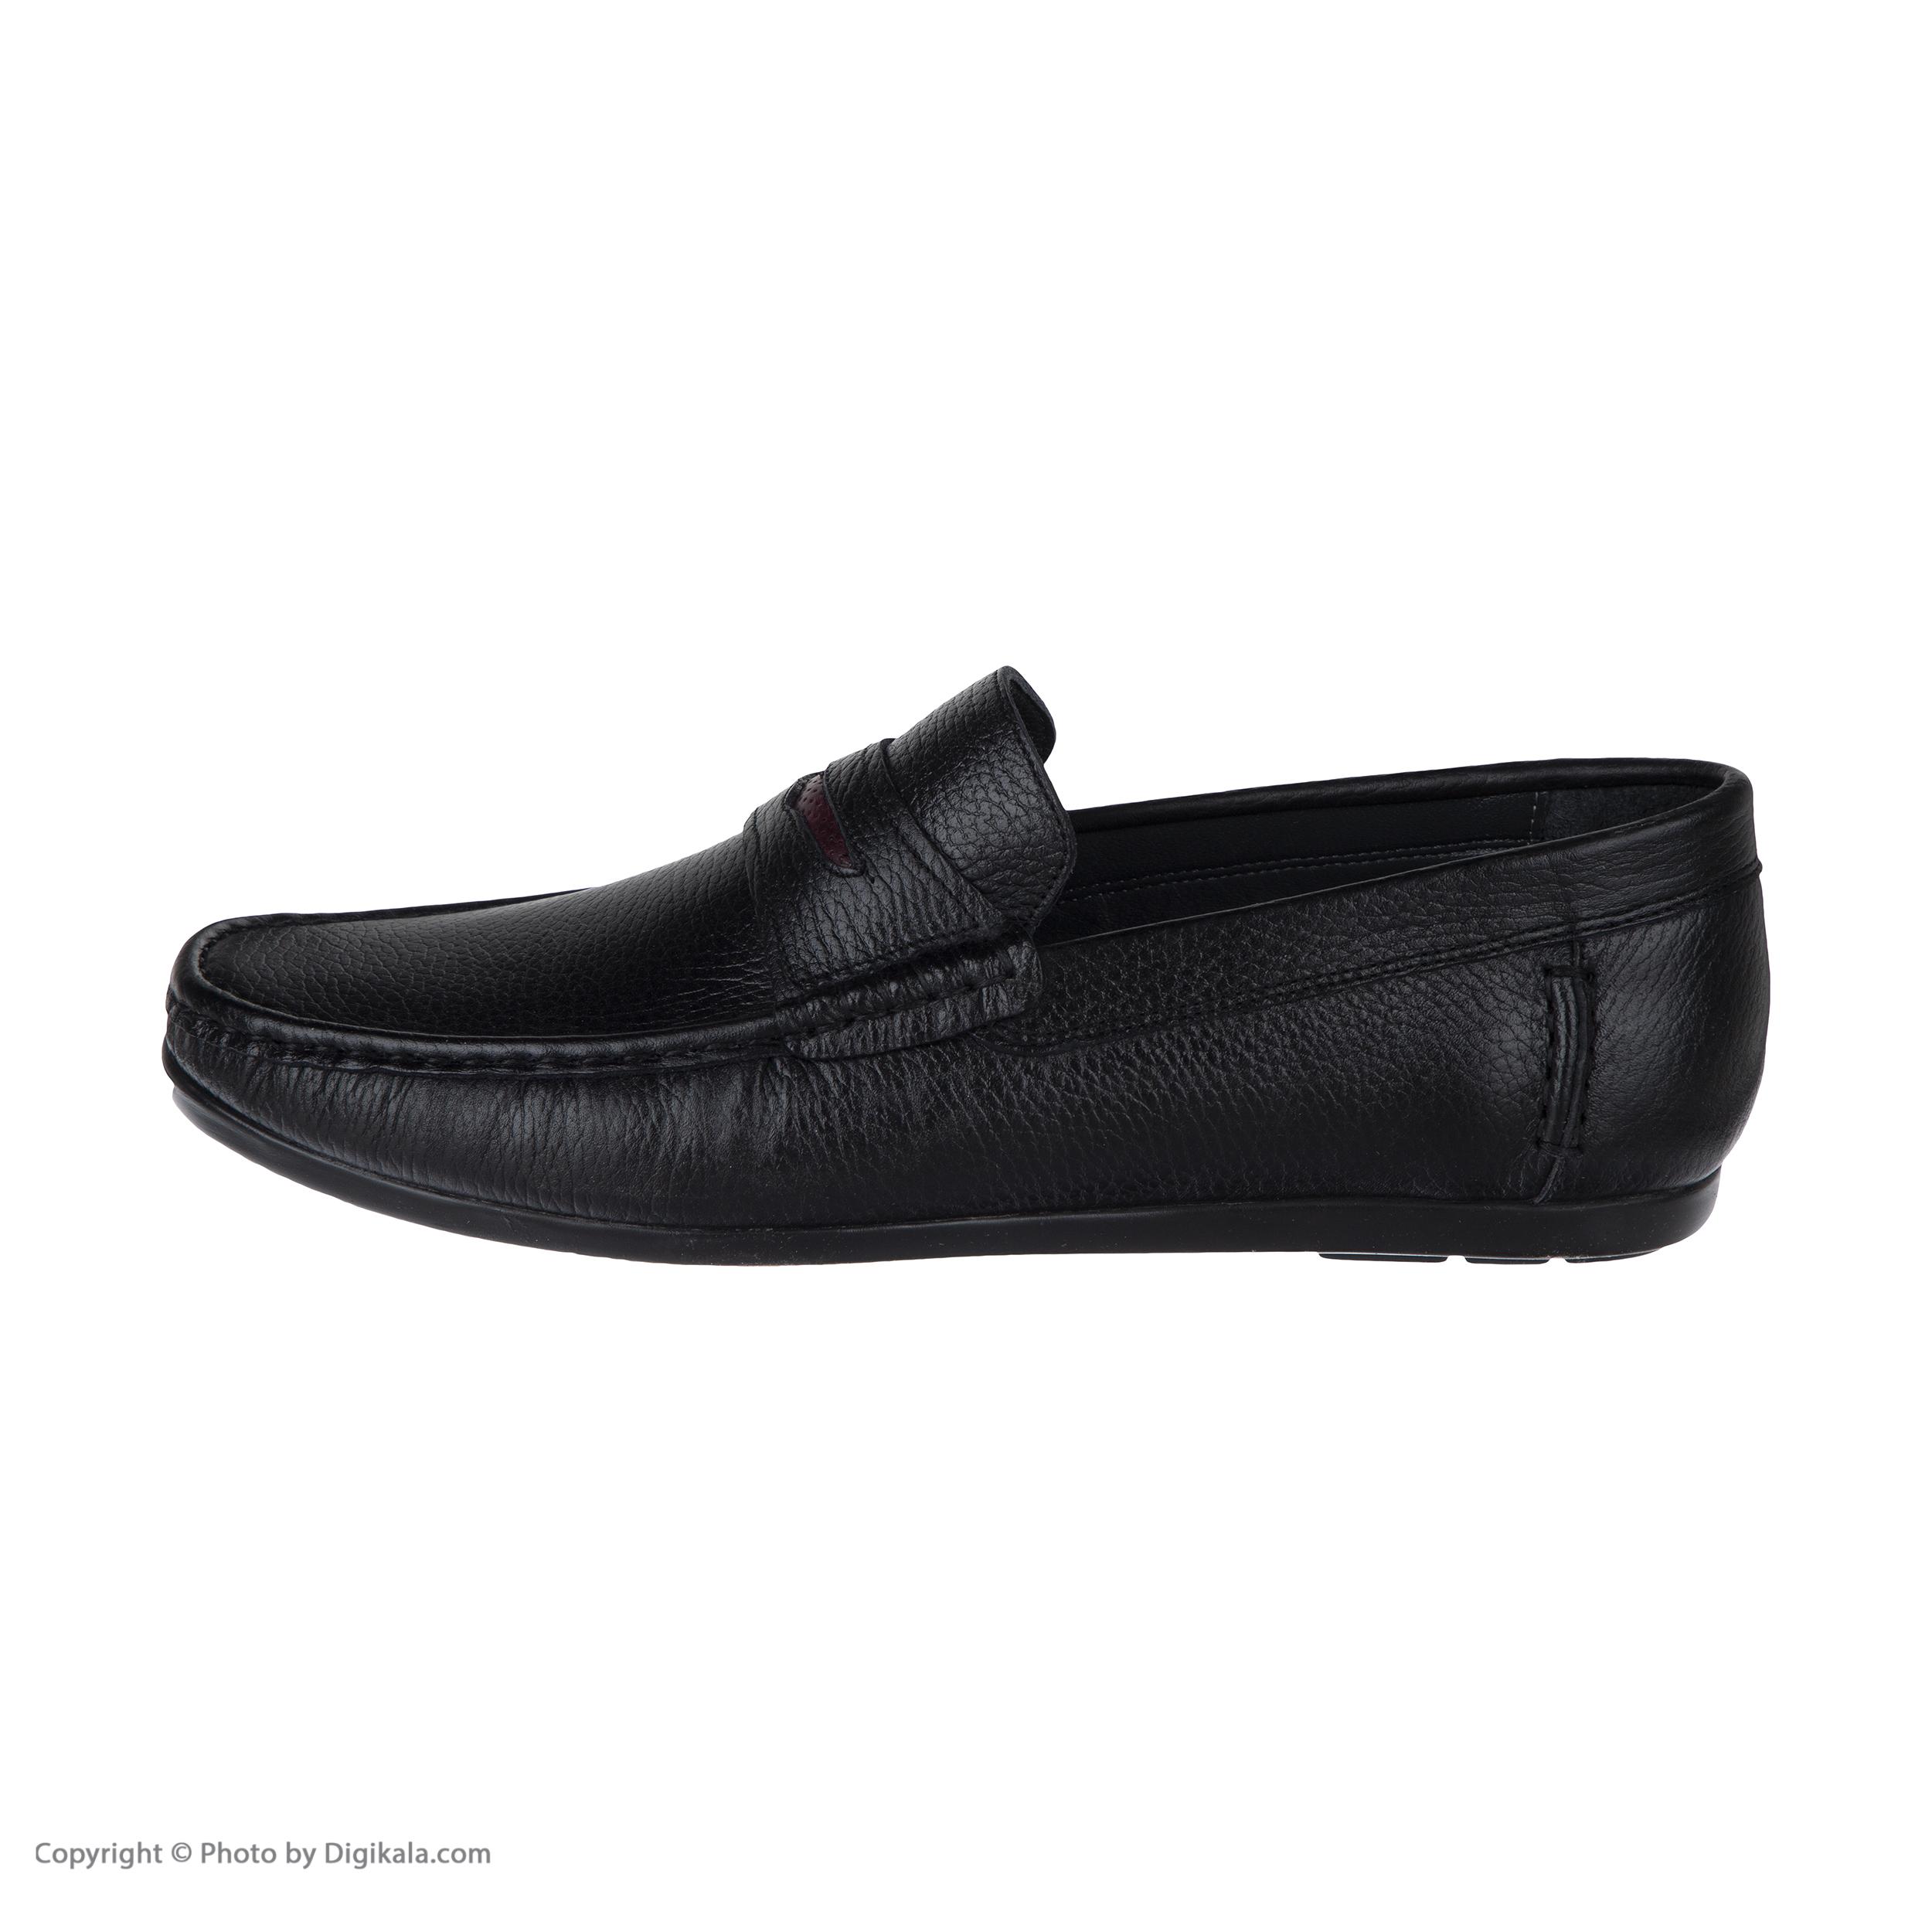 کفش روزمره مردانه ساتین مدل 7611A503101 -  - 3